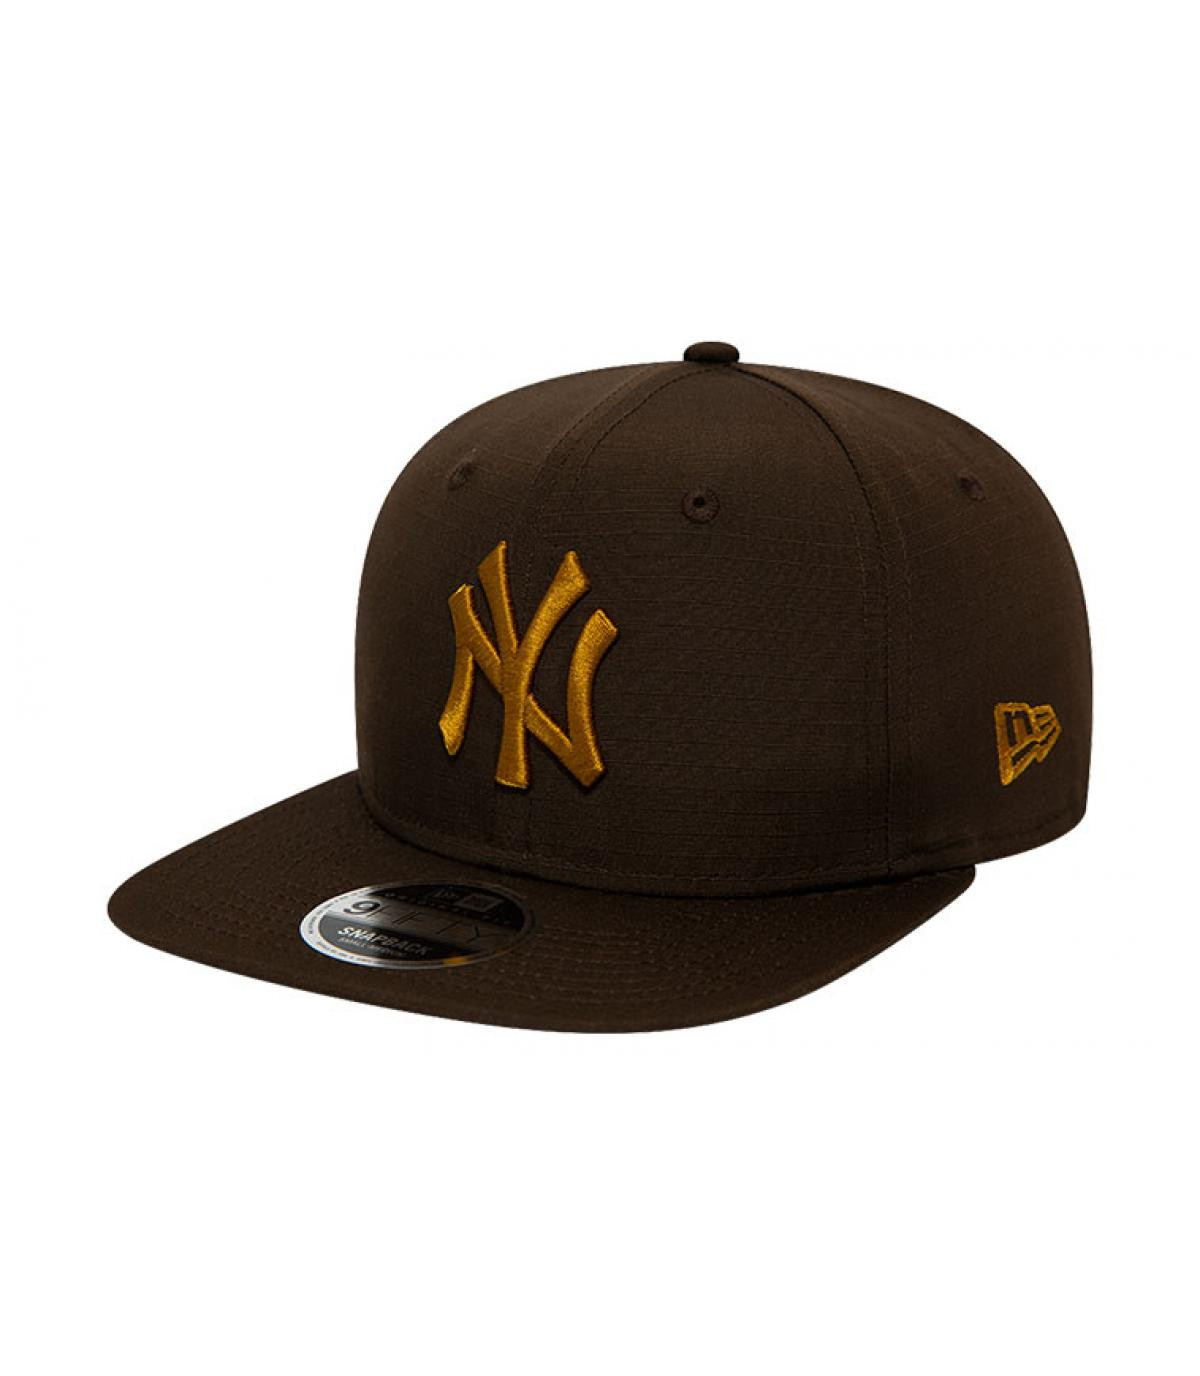 Détails Snapback MLB Utility NY 950 brown old gold - image 2